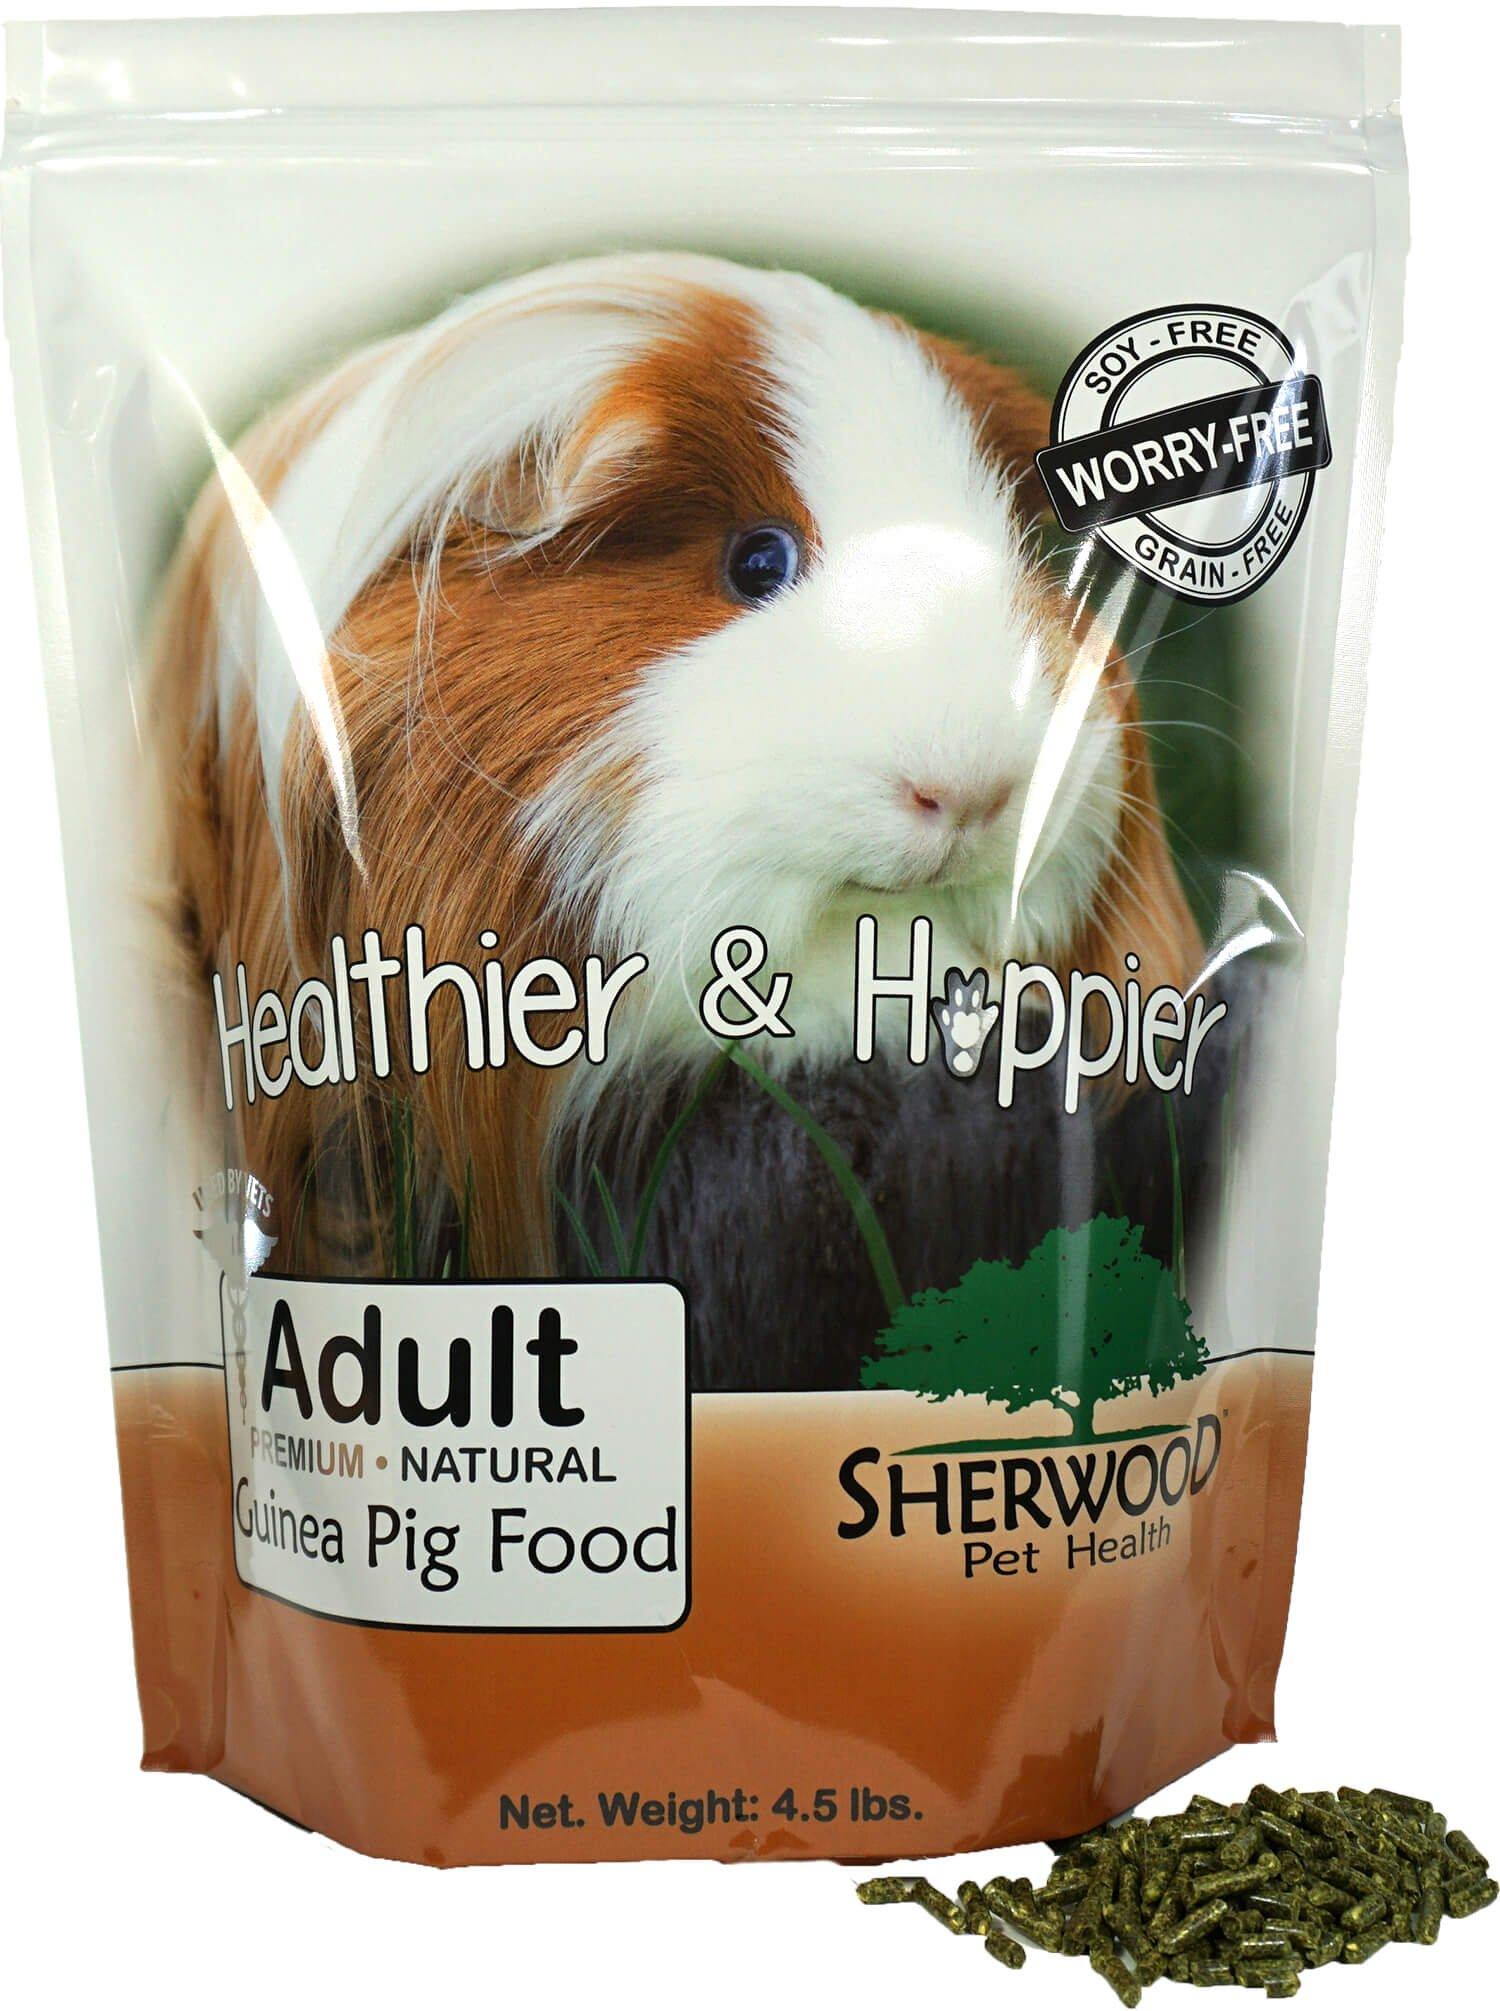 Sherwood Pet Health Guinea Pig Food, Adult by, 4.5 lb. Timothy blend (Grain & Soy-Free) - 4.5 lb. (Vet Used)